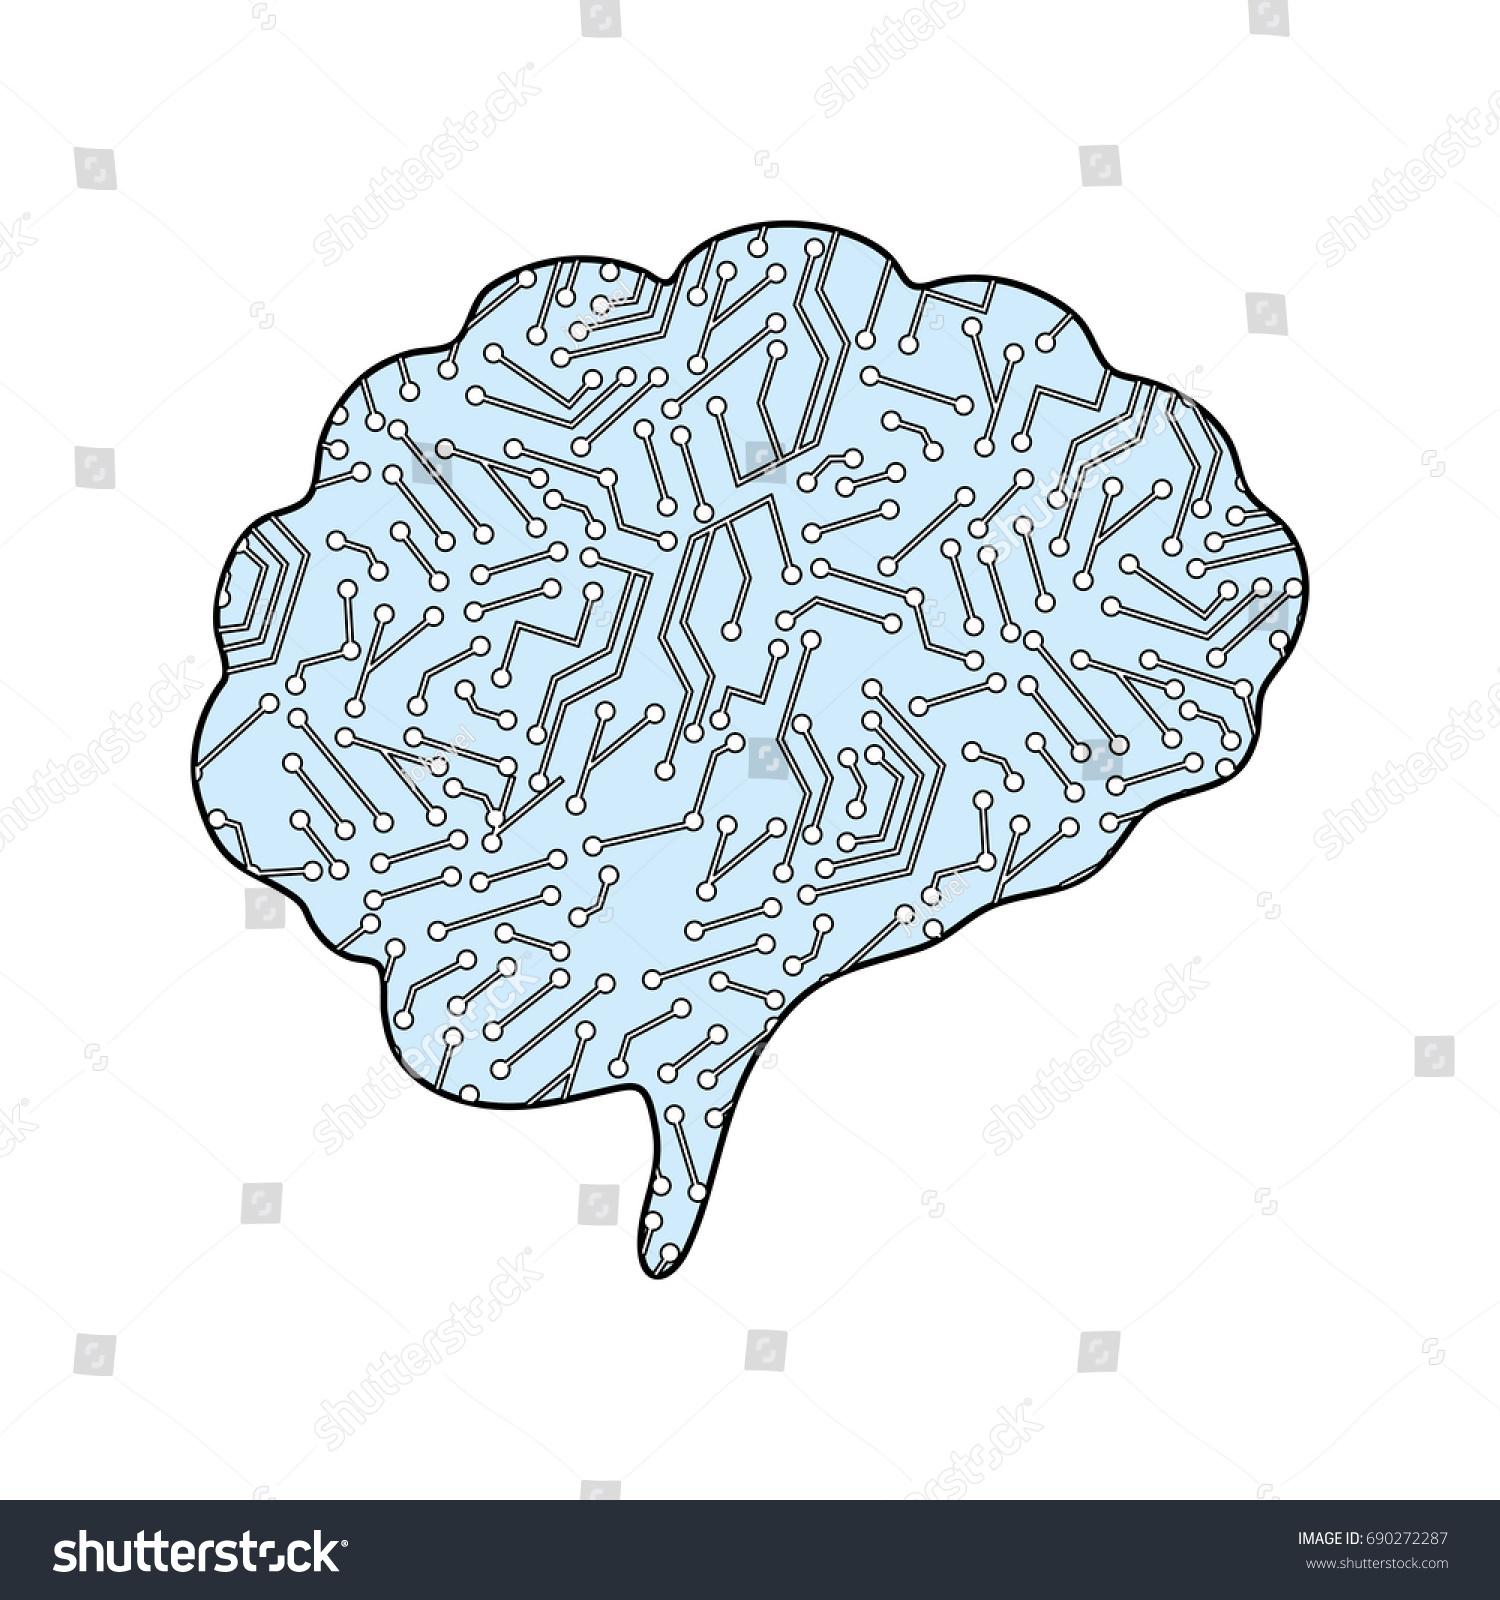 Human brain symbol stock vector 690272287 shutterstock human brain symbol biocorpaavc Images